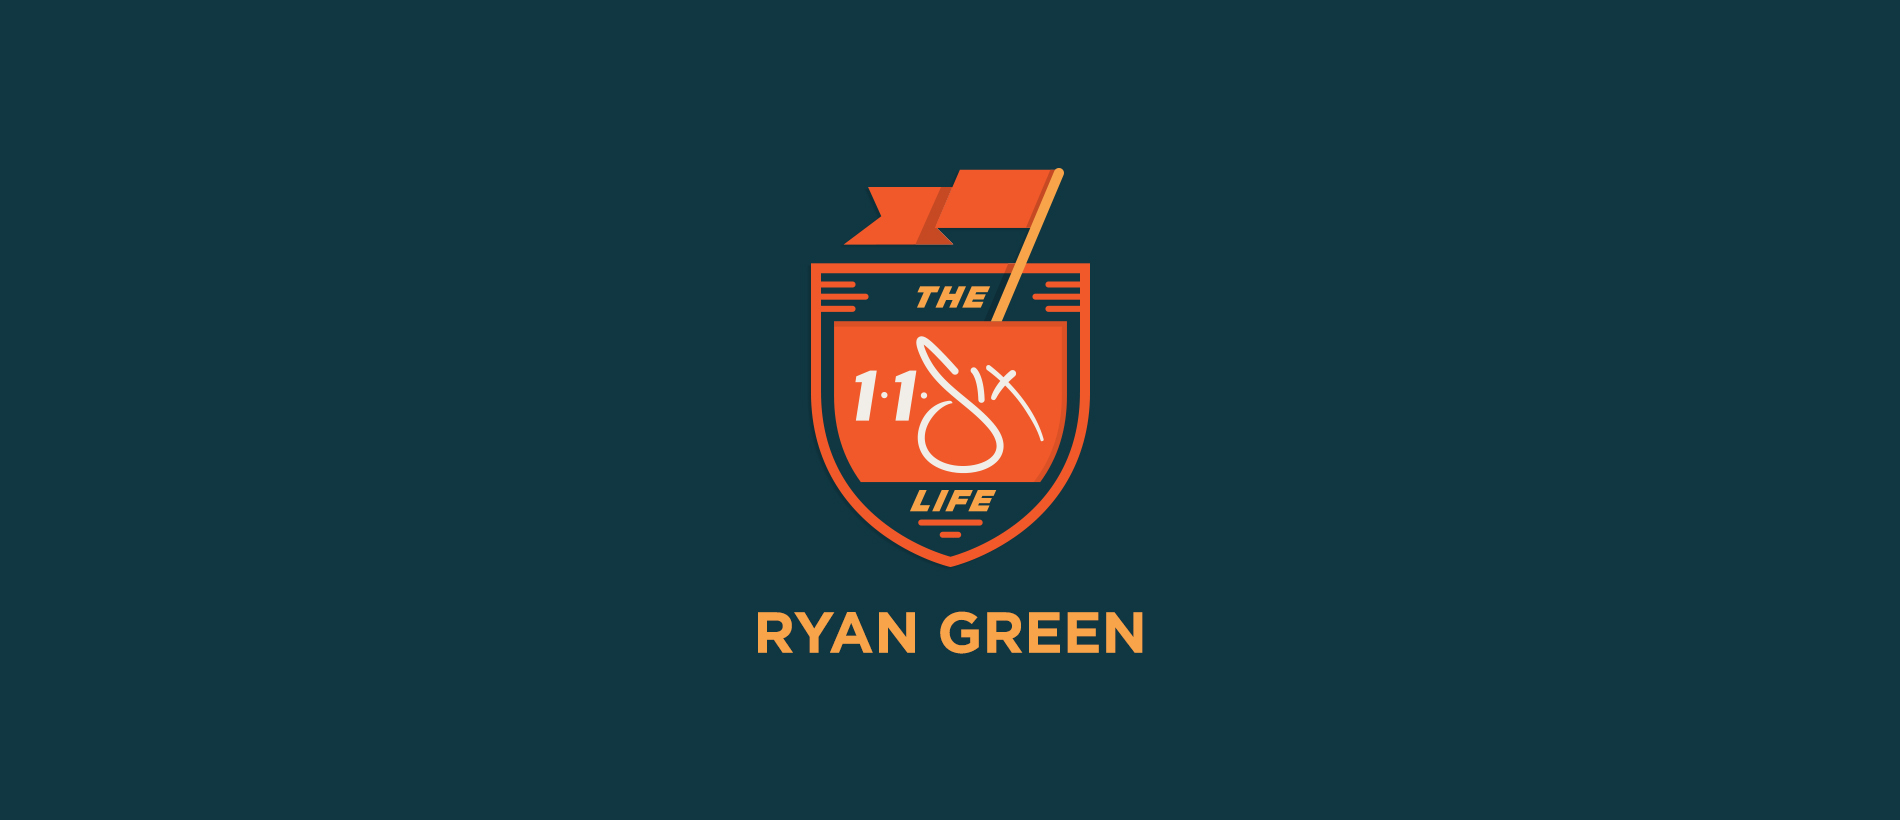 116 Life x Ryan Green